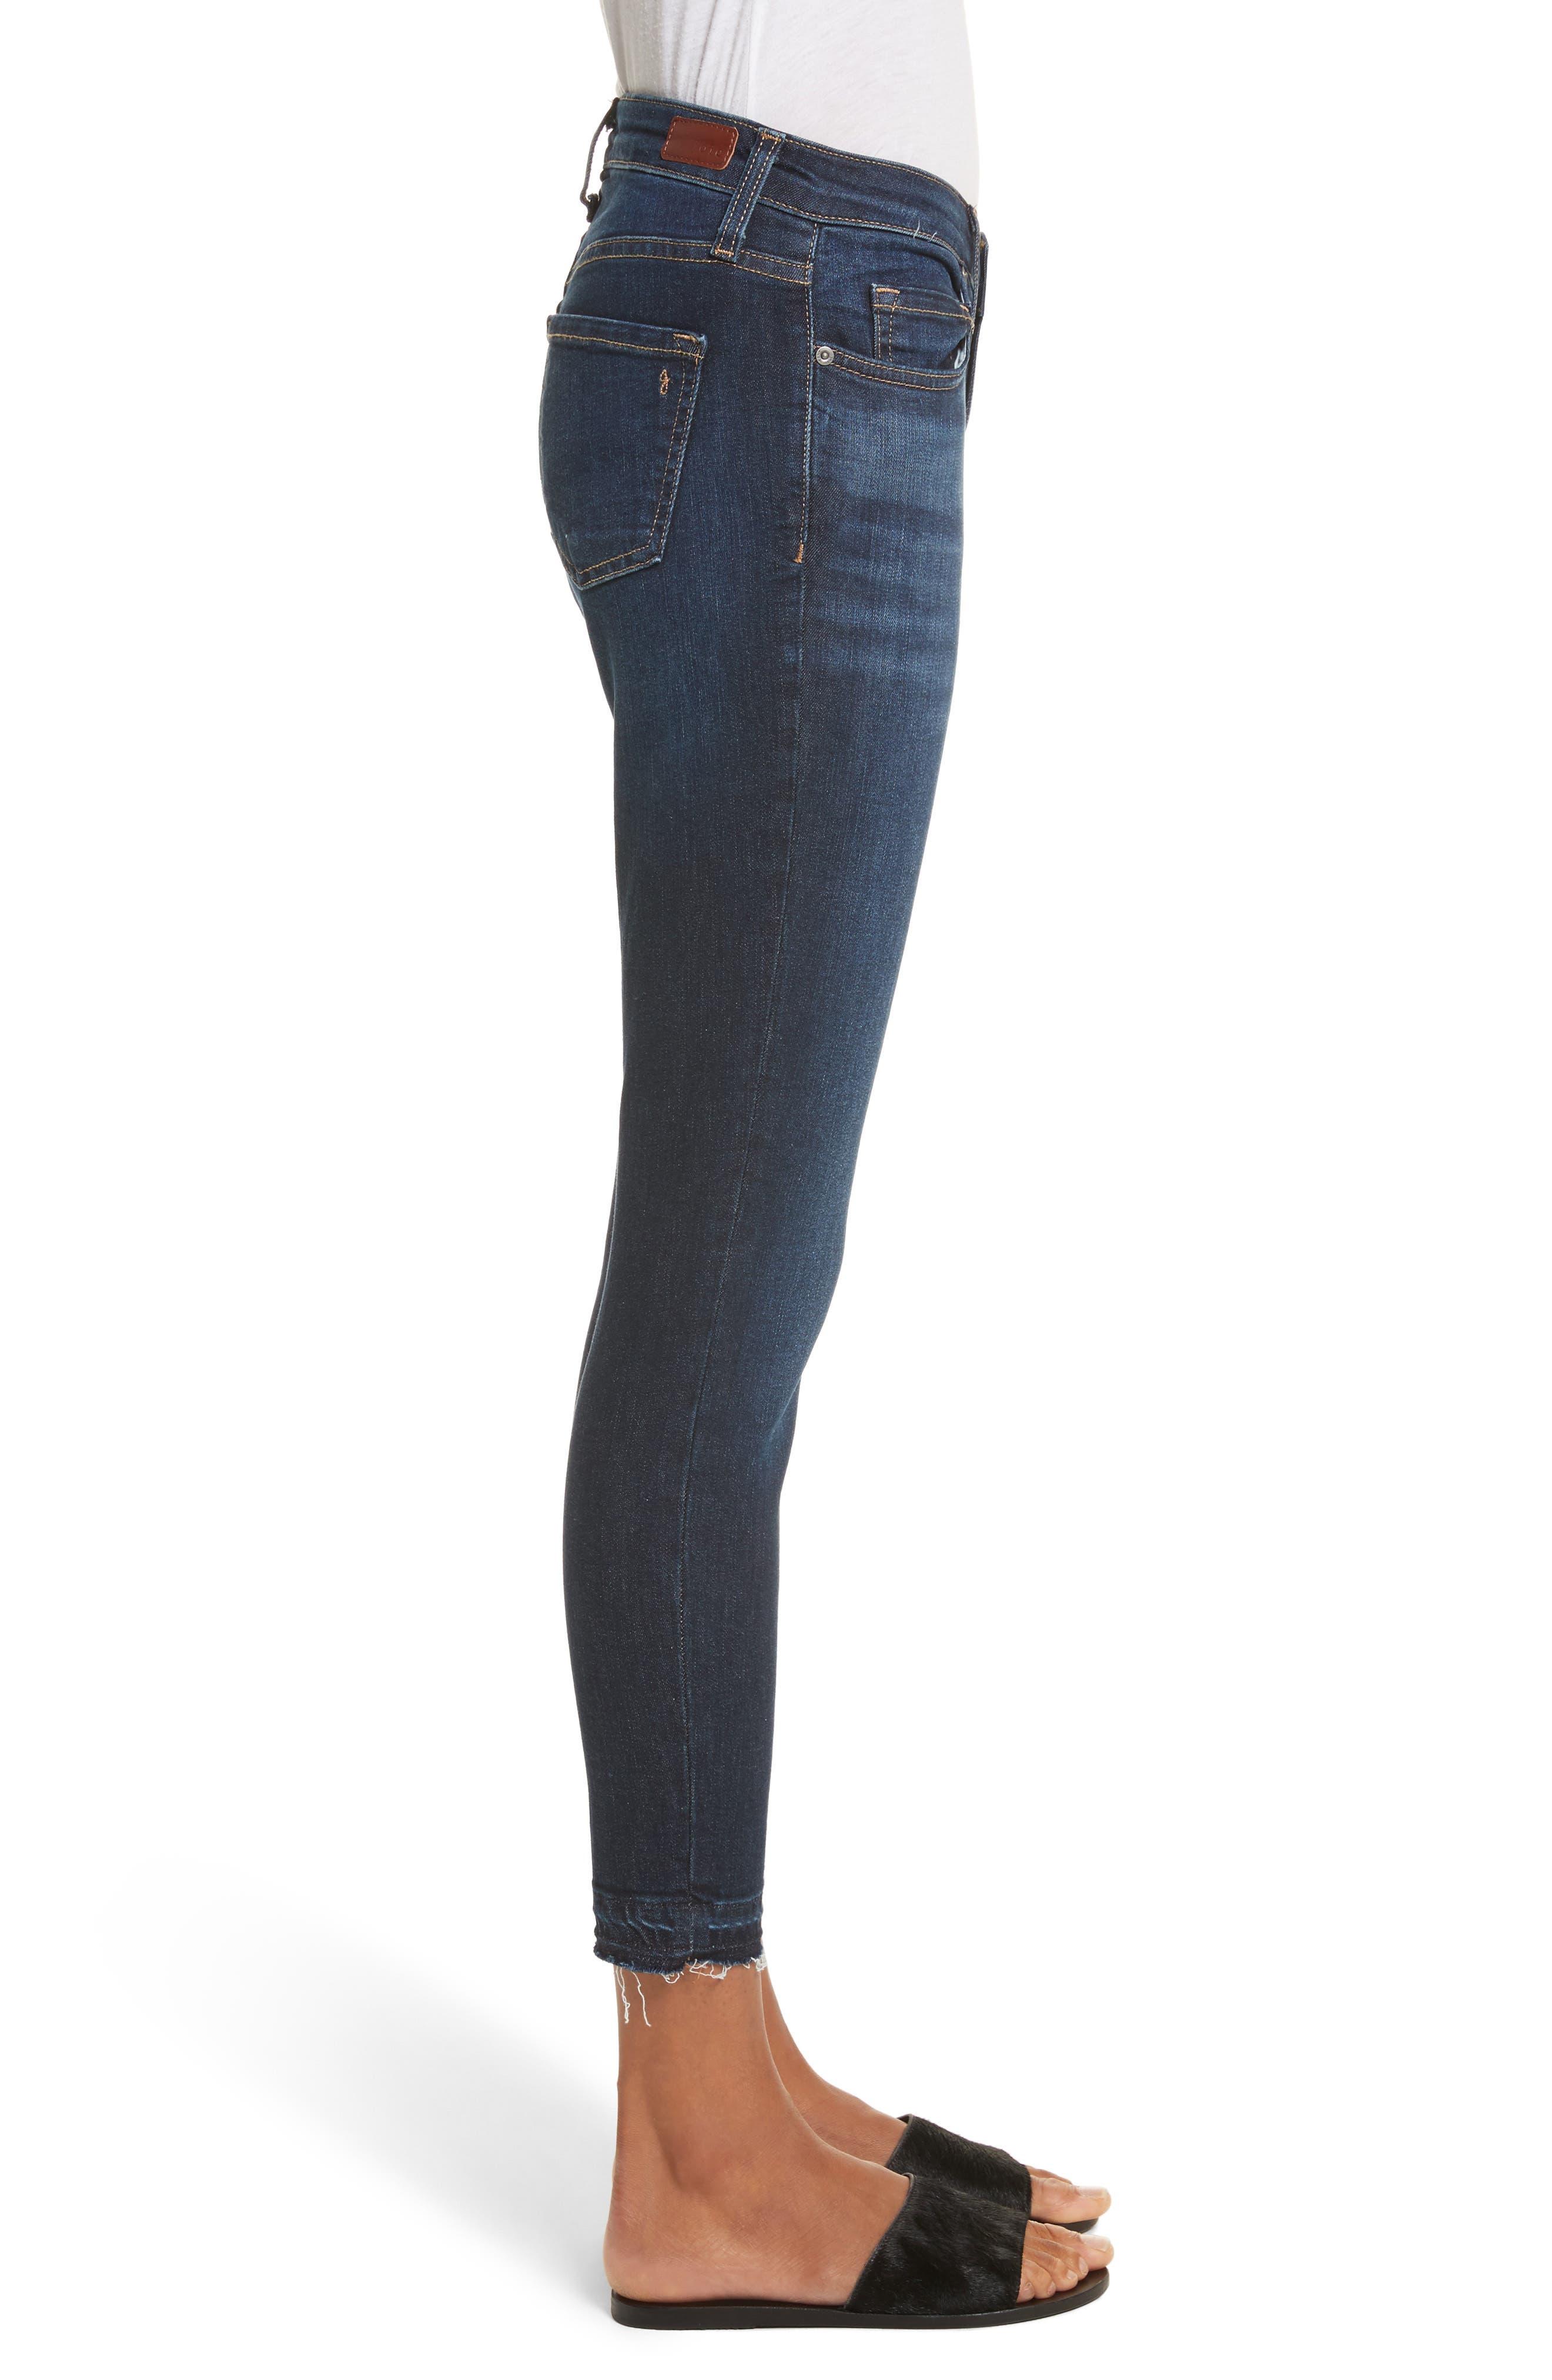 Ankle Skinny Jeans,                             Alternate thumbnail 2, color,                             Indigo Raven With Release Hem